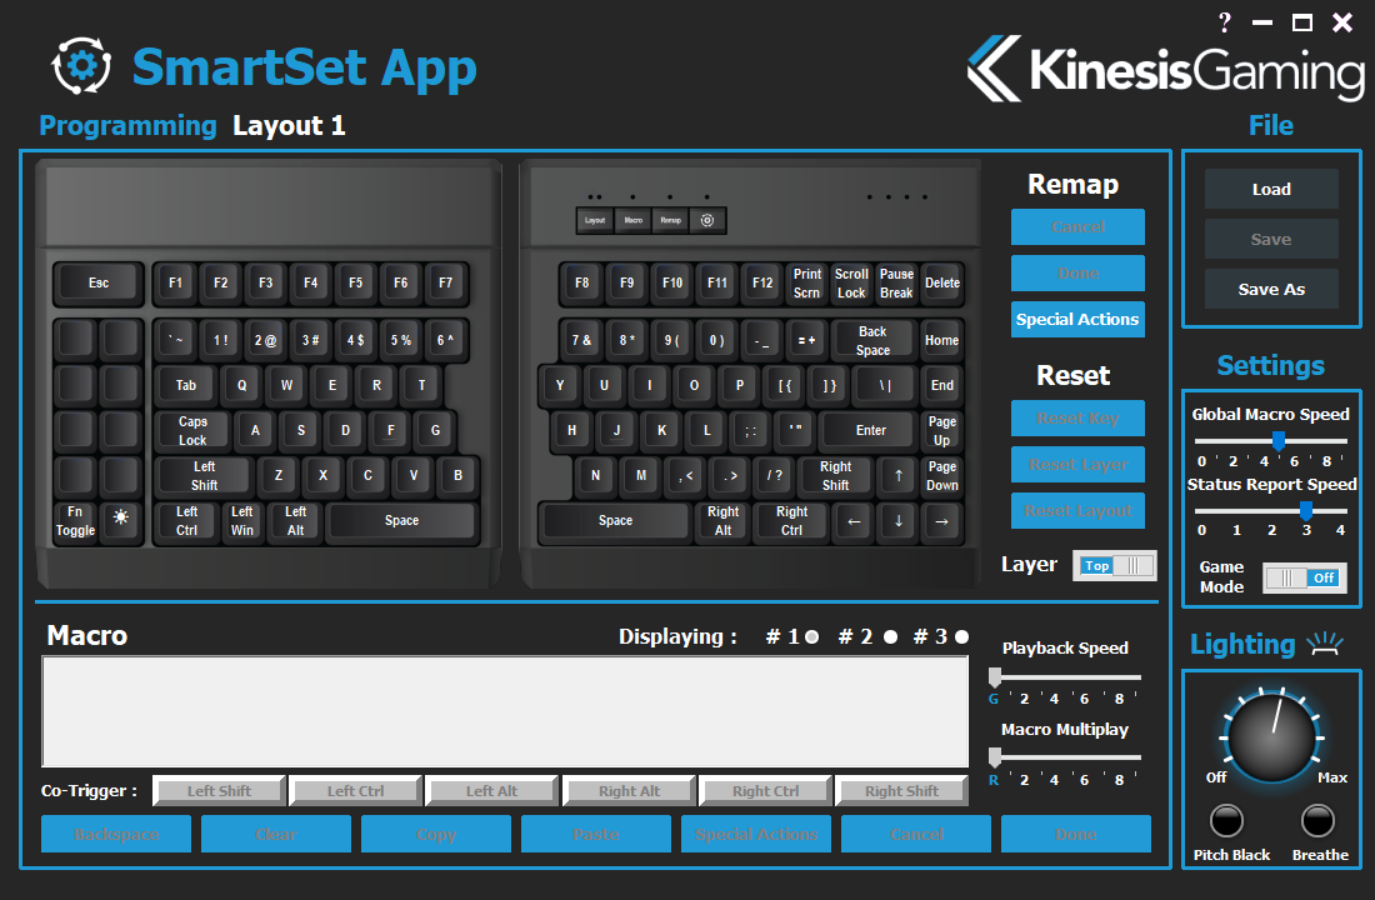 The KinesisGaming SmartSet App - The Kinesis Freestyle Edge Gaming